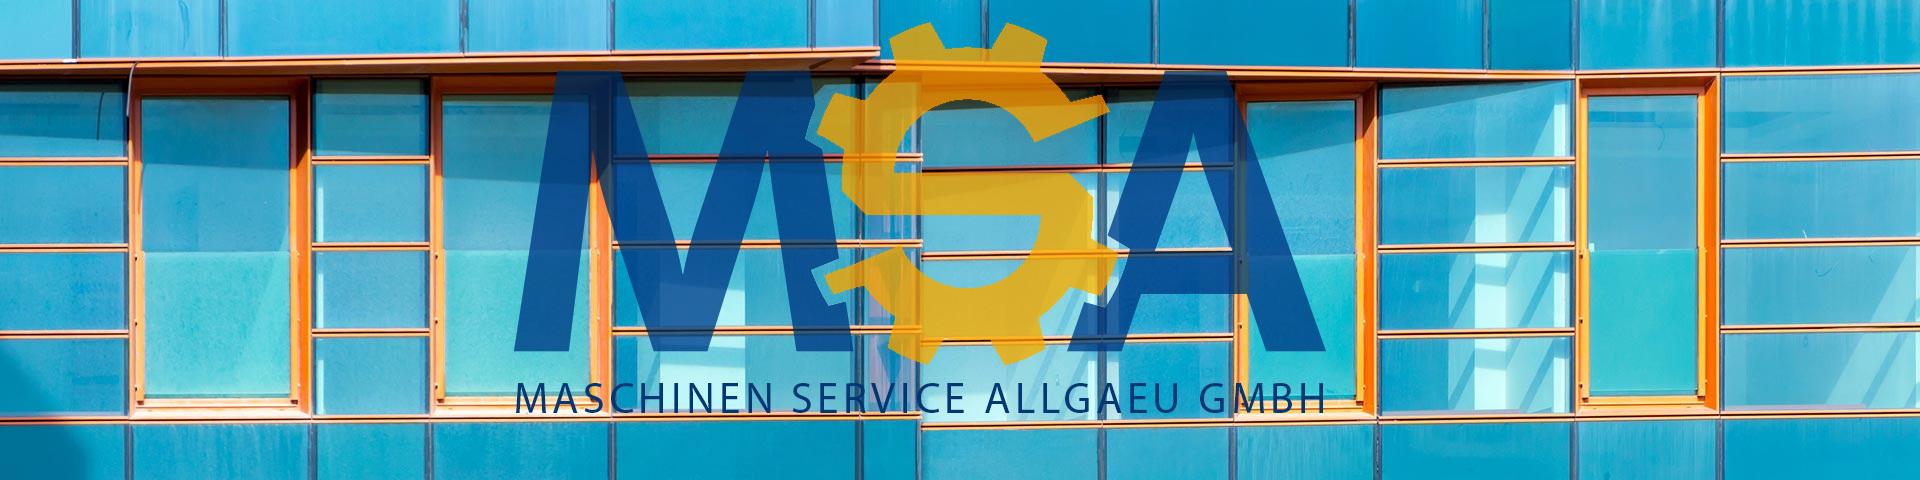 Maschinen Service Allgaeu GmbH